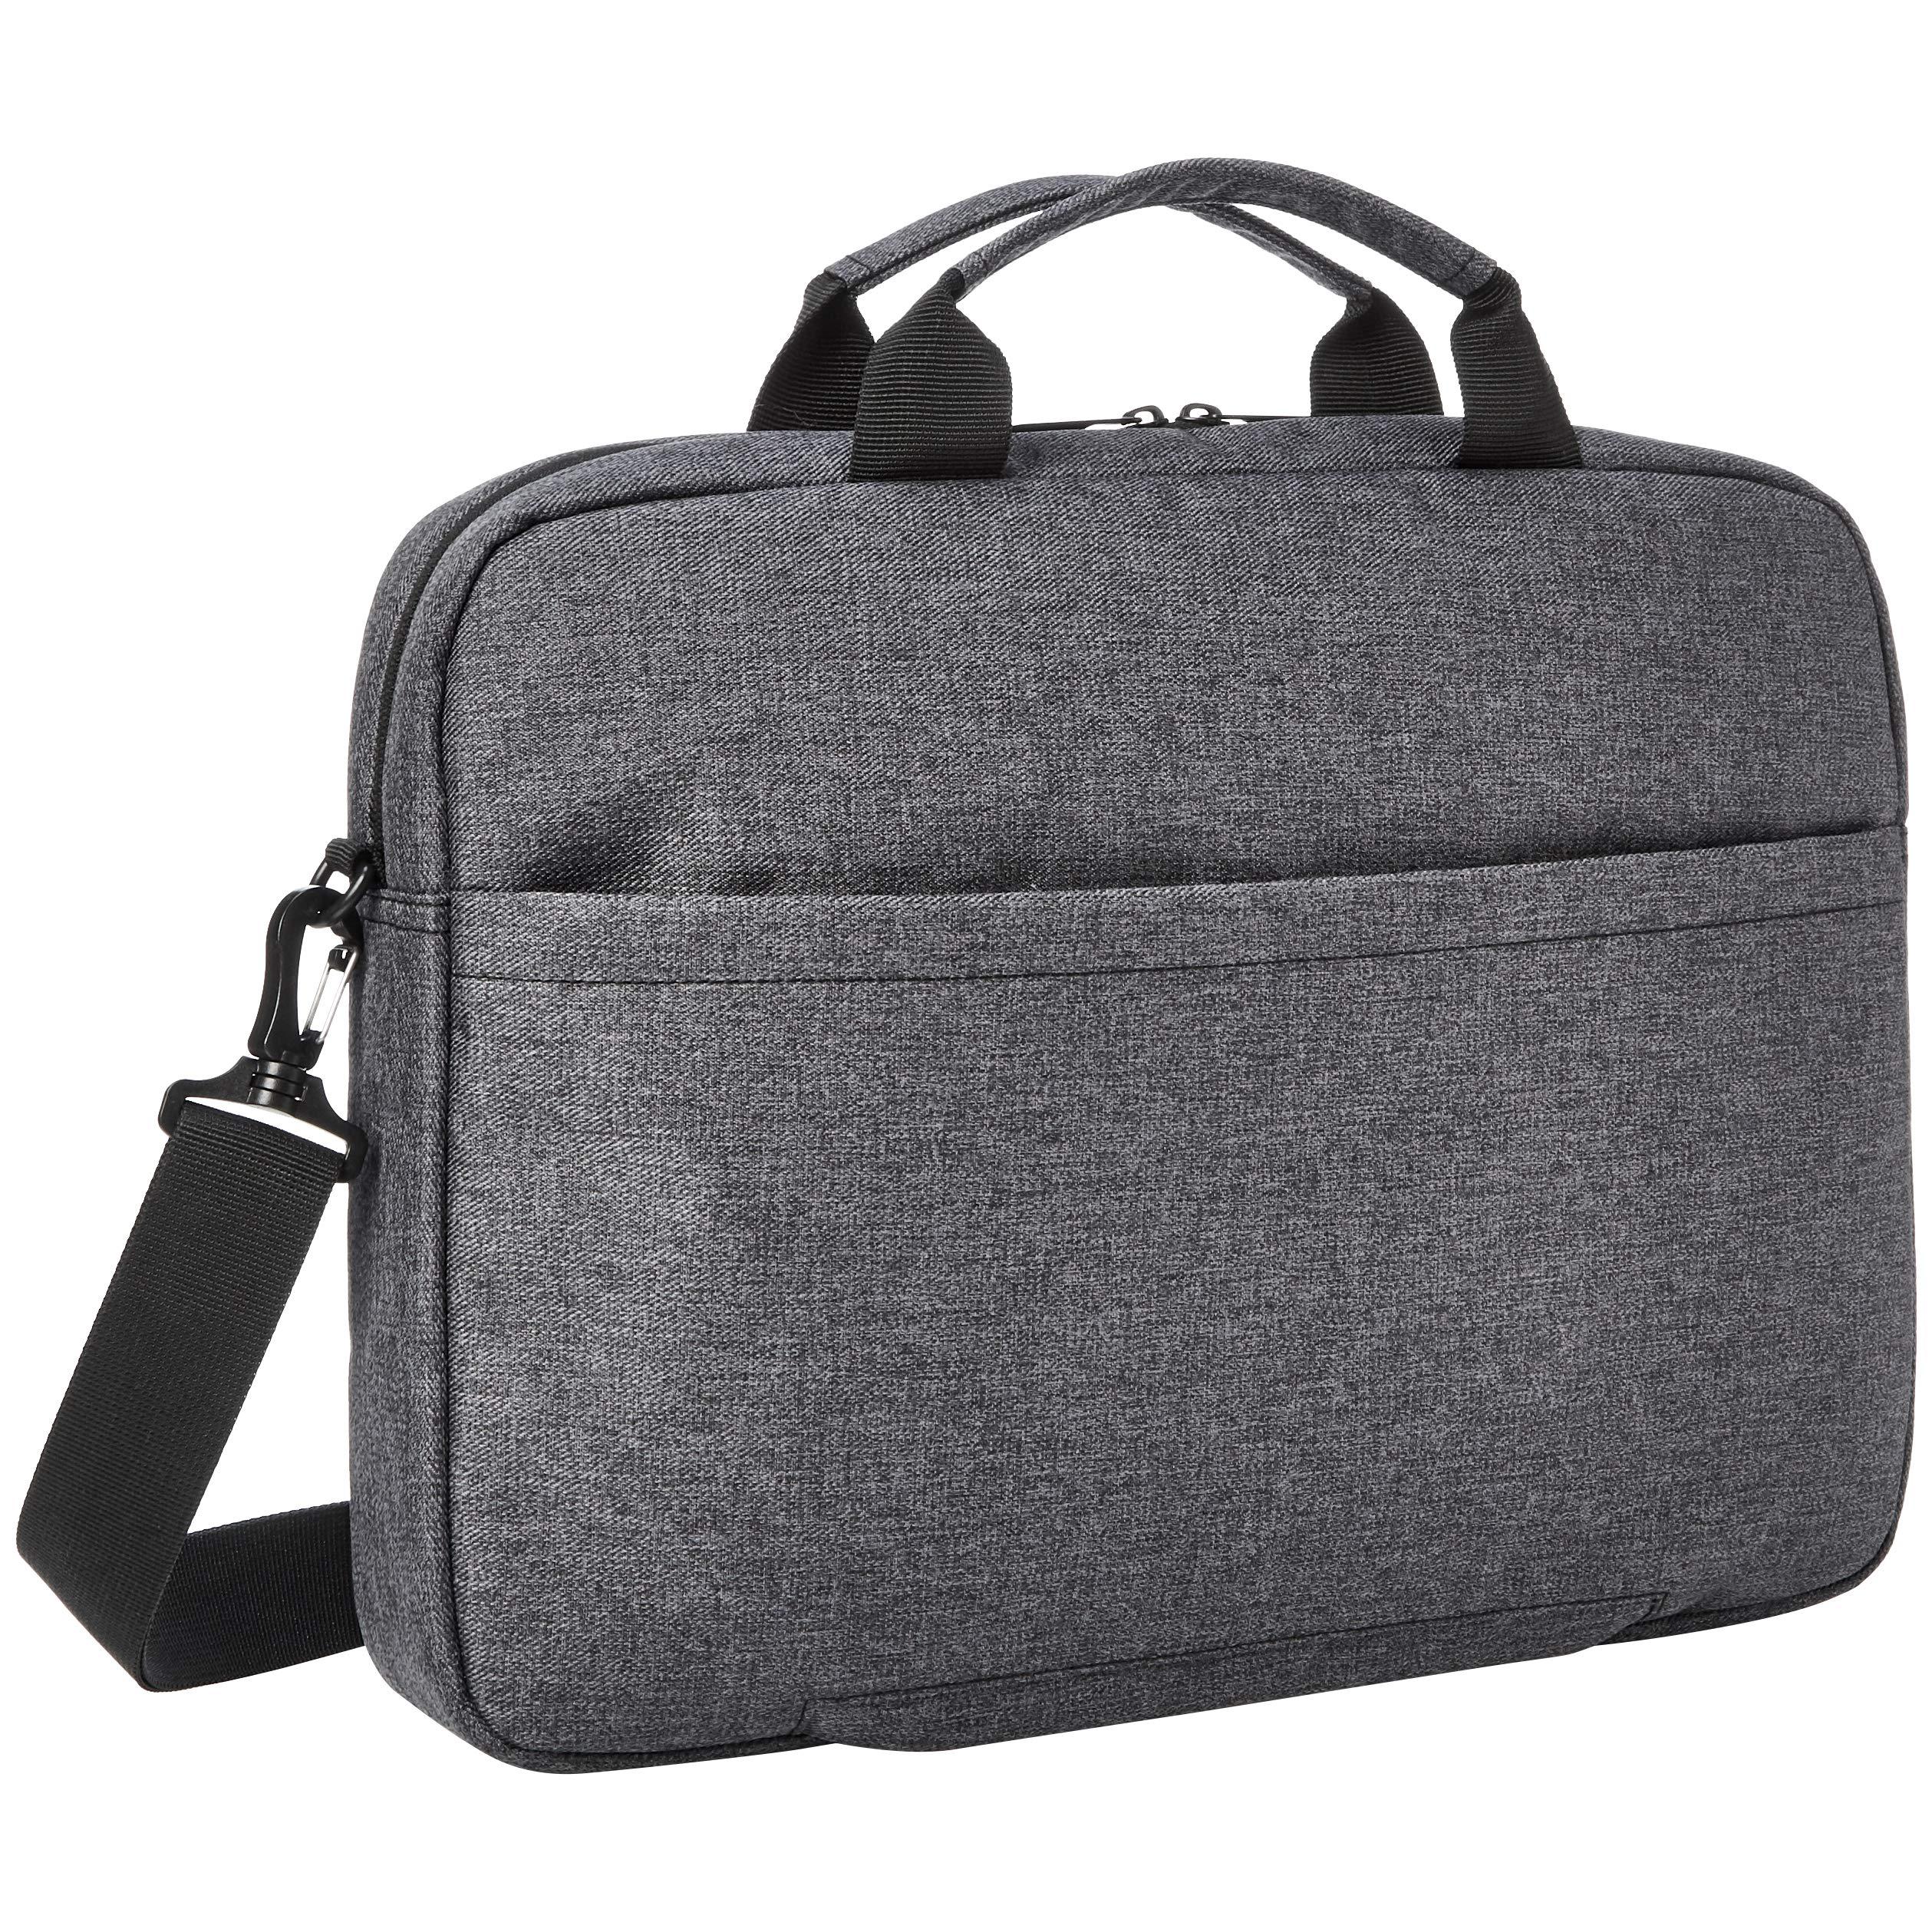 AmazonBasics Urban Laptop and Tablet Case Bag, 17 Inch, Grey by AmazonBasics (Image #3)